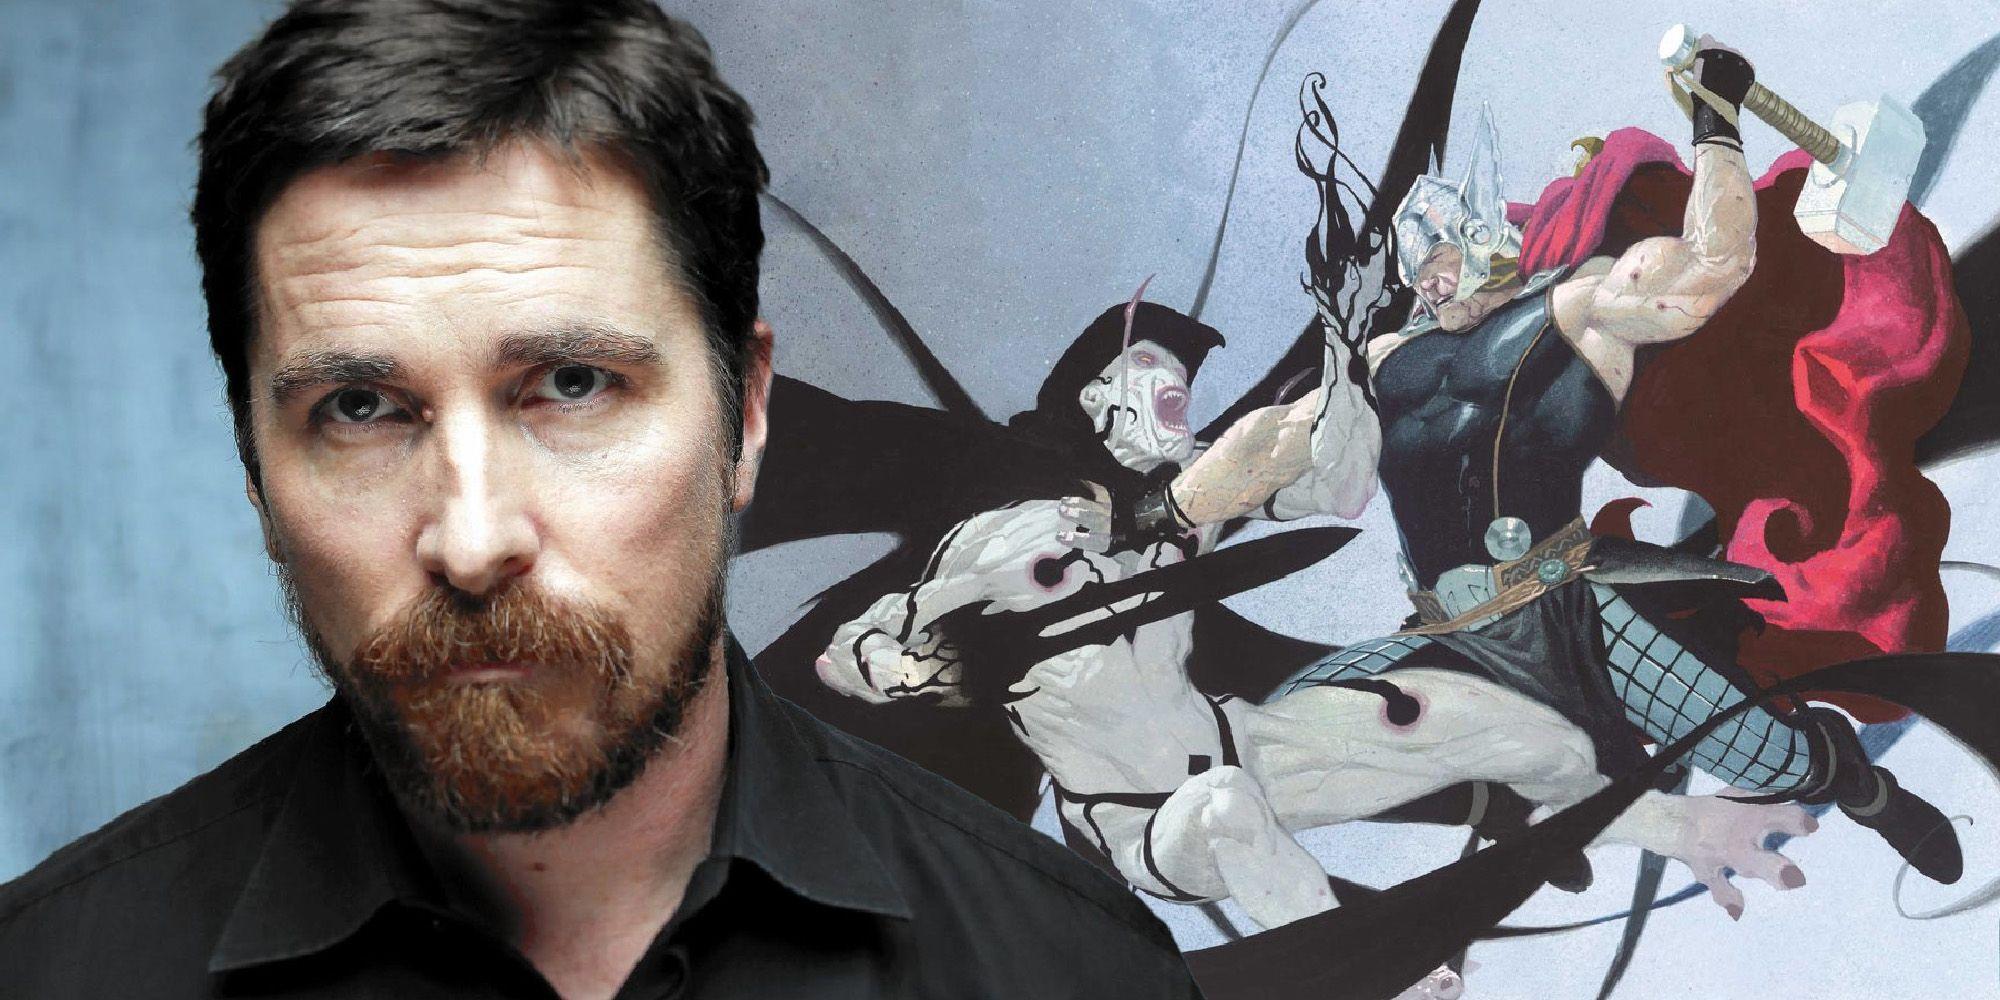 Who Is Gorr the God Butcher? Christian Bale's Thor 4 Villain Explained